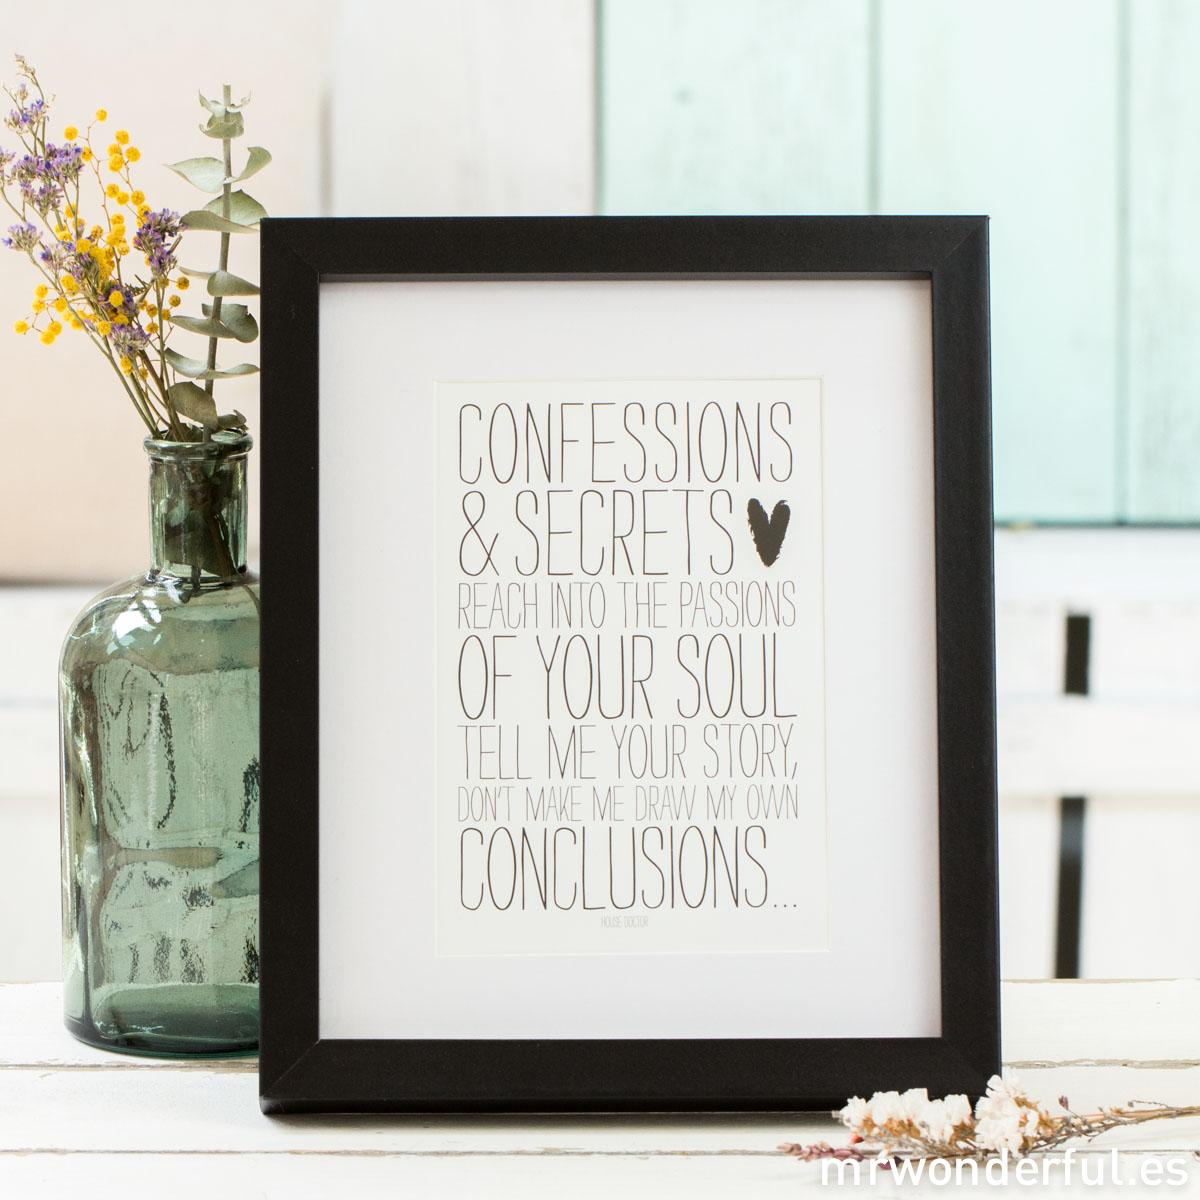 mrwonderful_IGO105_cuadro_confessions-secrets-2